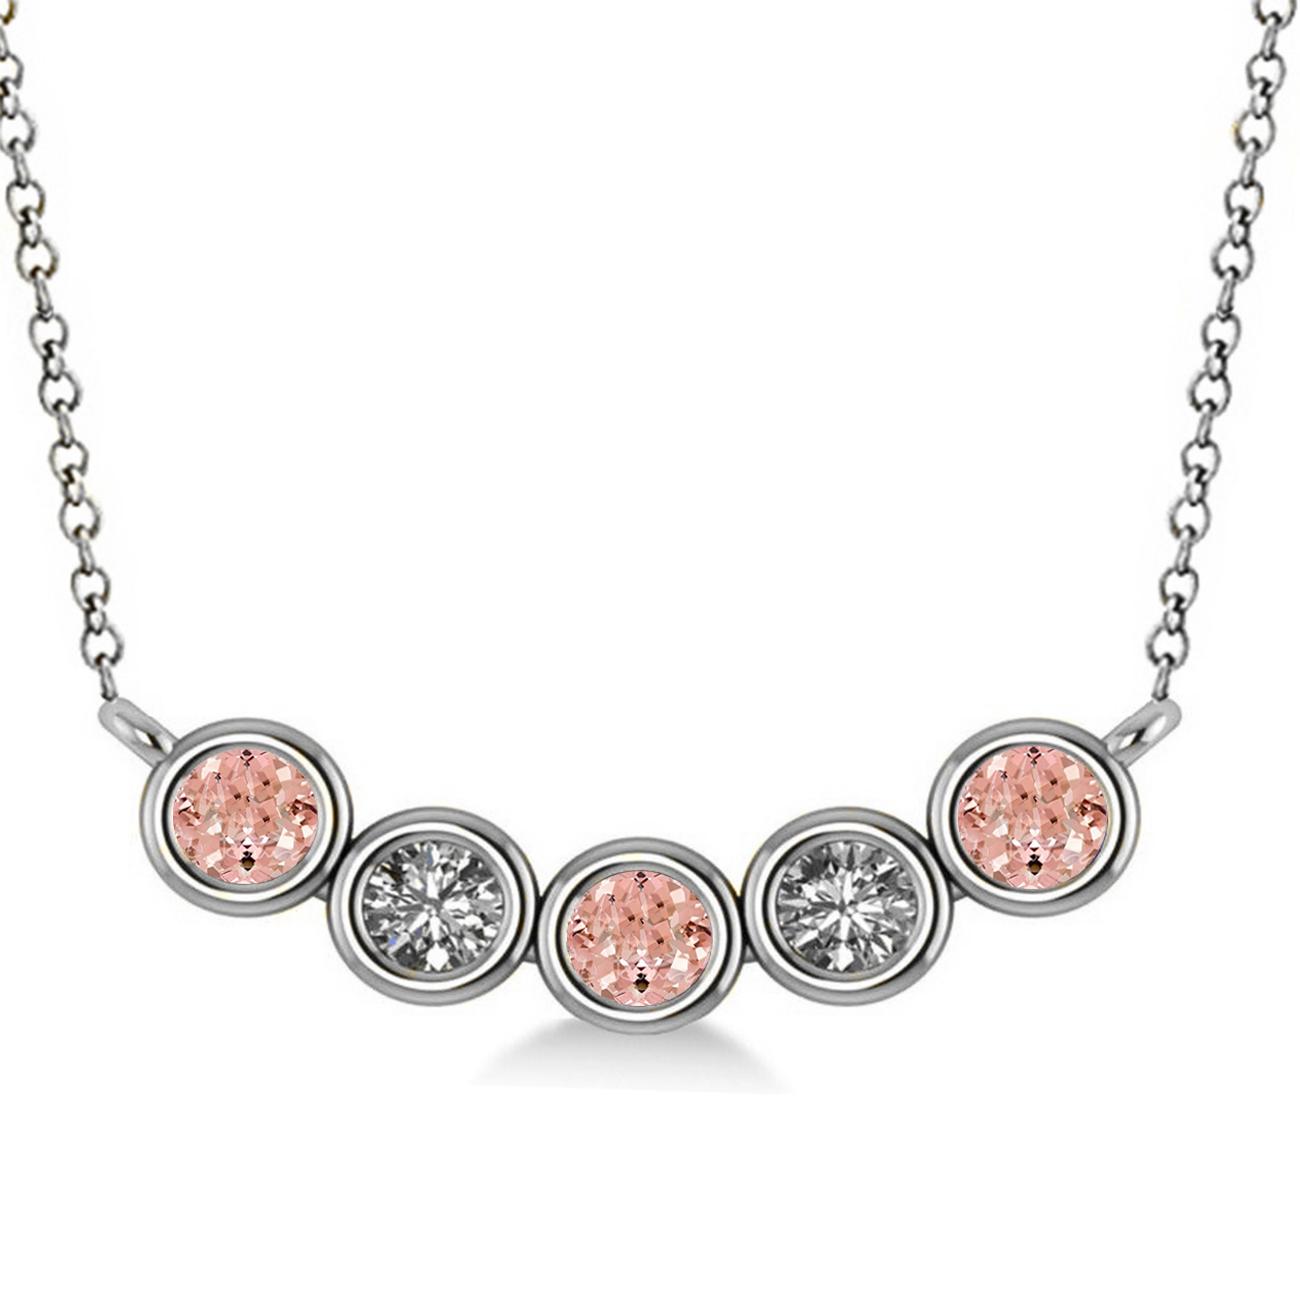 Diamond & Morganite 5-Stone Pendant Necklace 14k White Gold 0.25ct